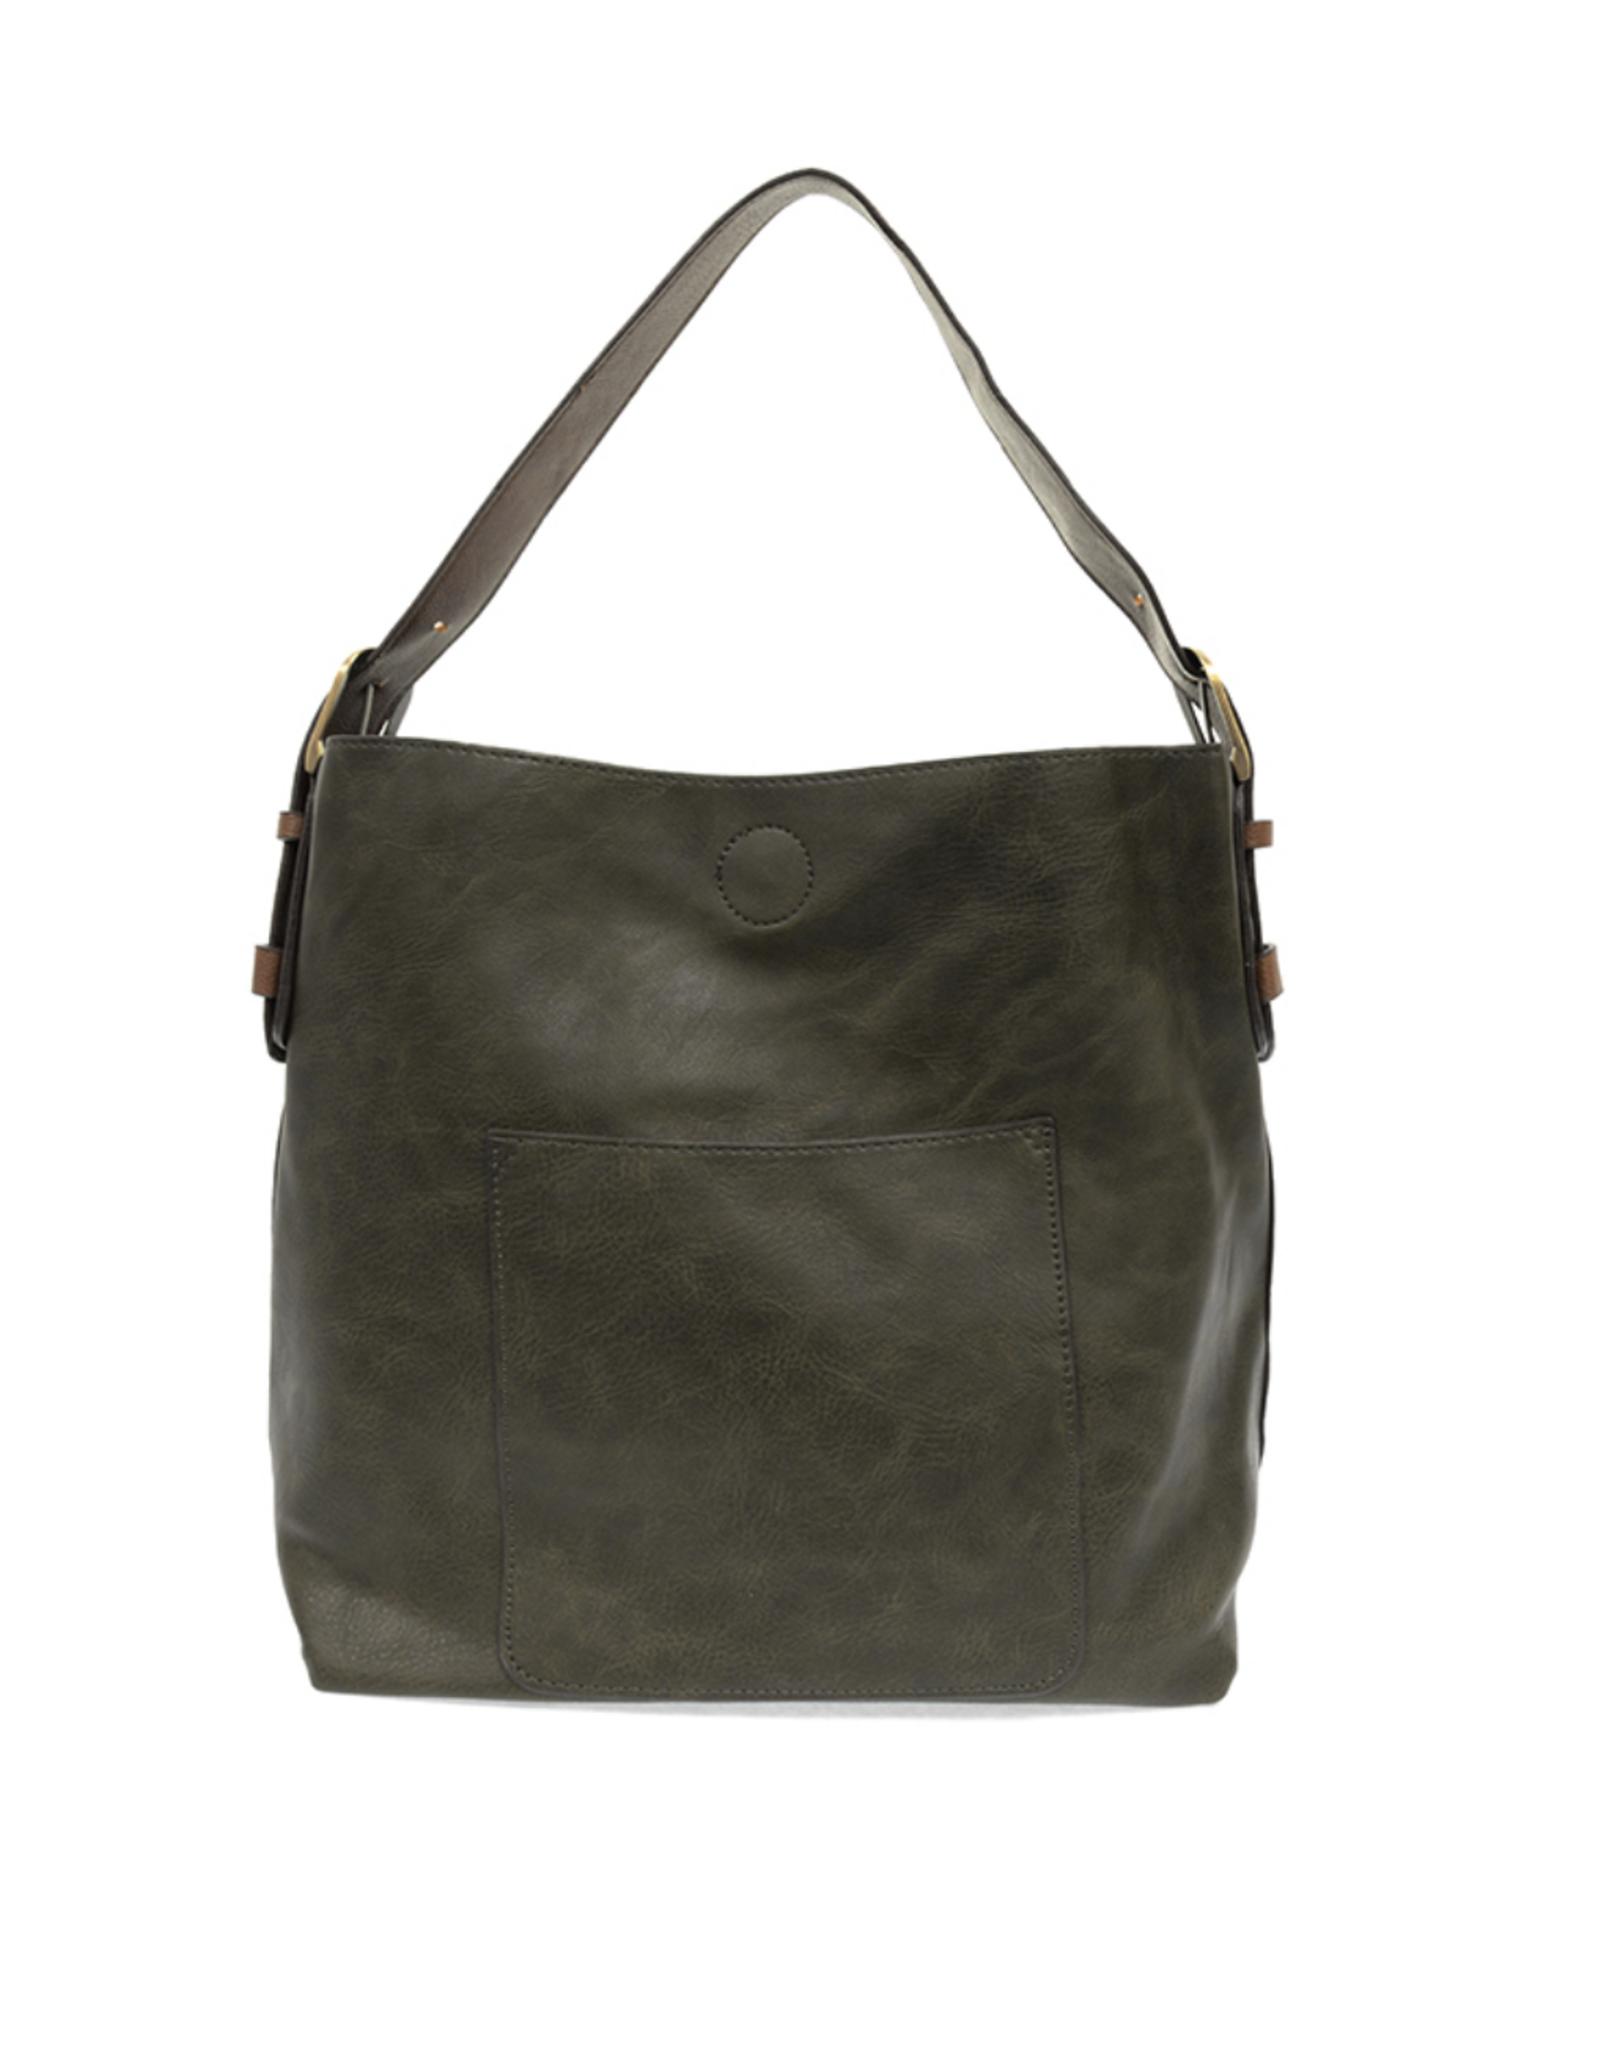 Classic Hobo Brown Handle Handbag  (3 colors!)